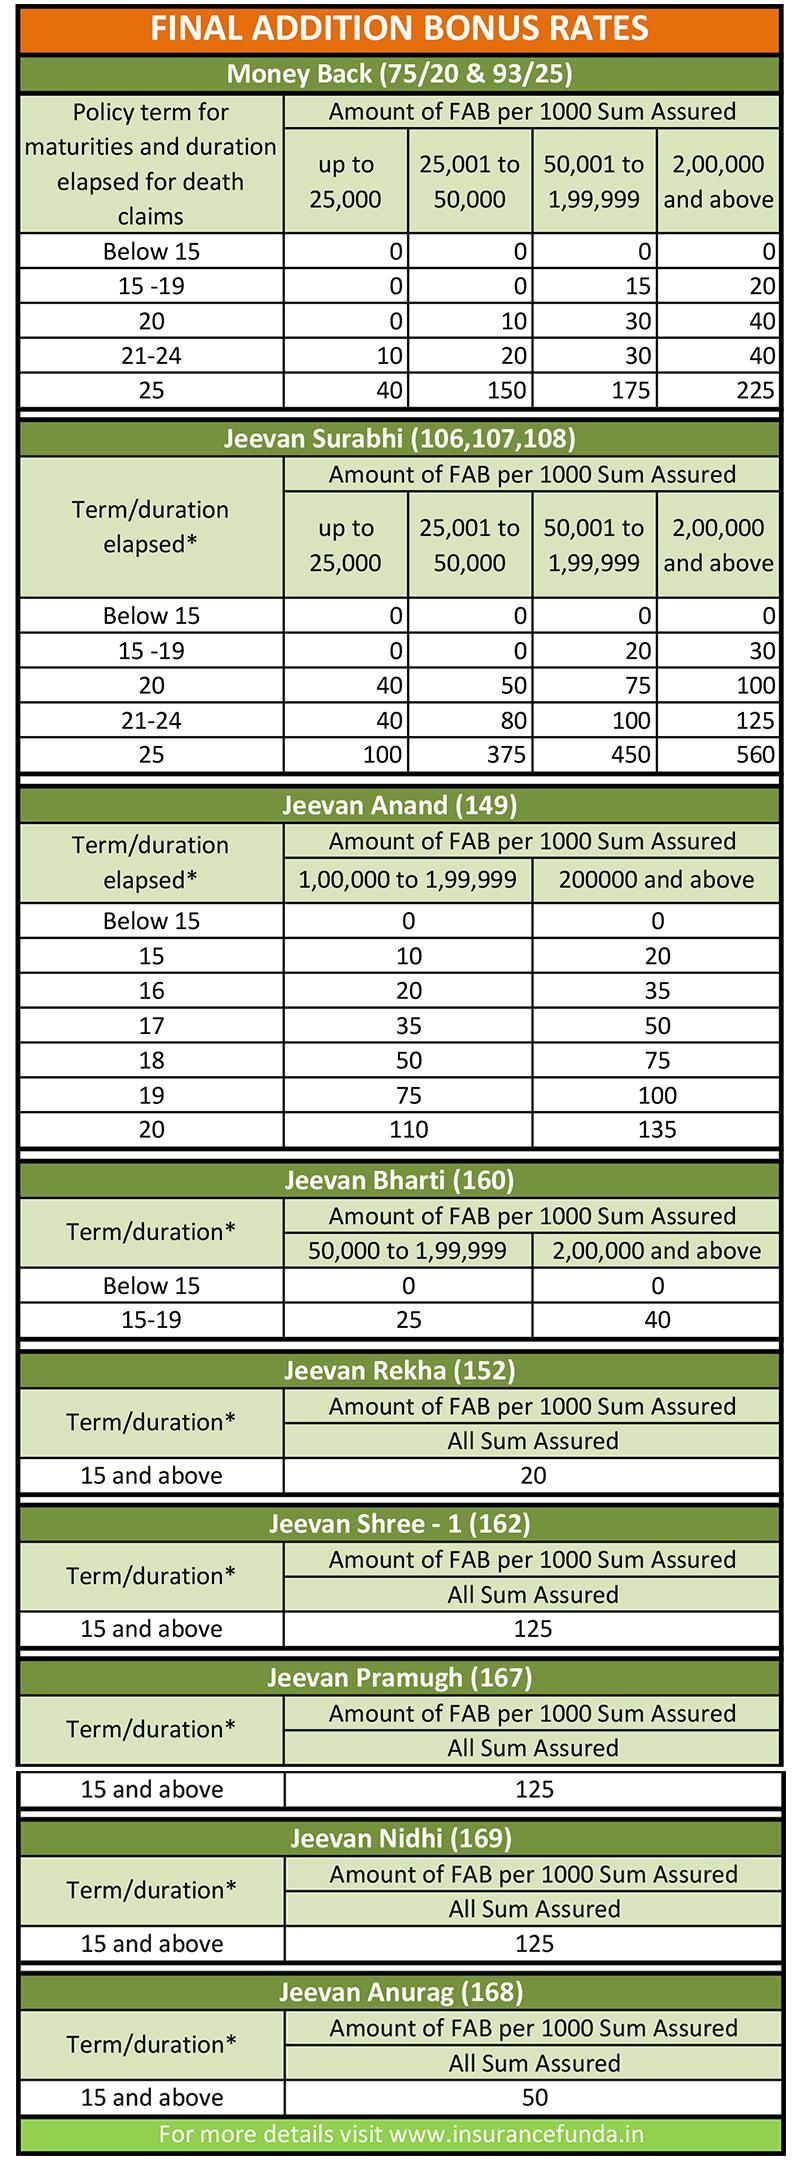 Final addition bonus rates popular plans of LIC